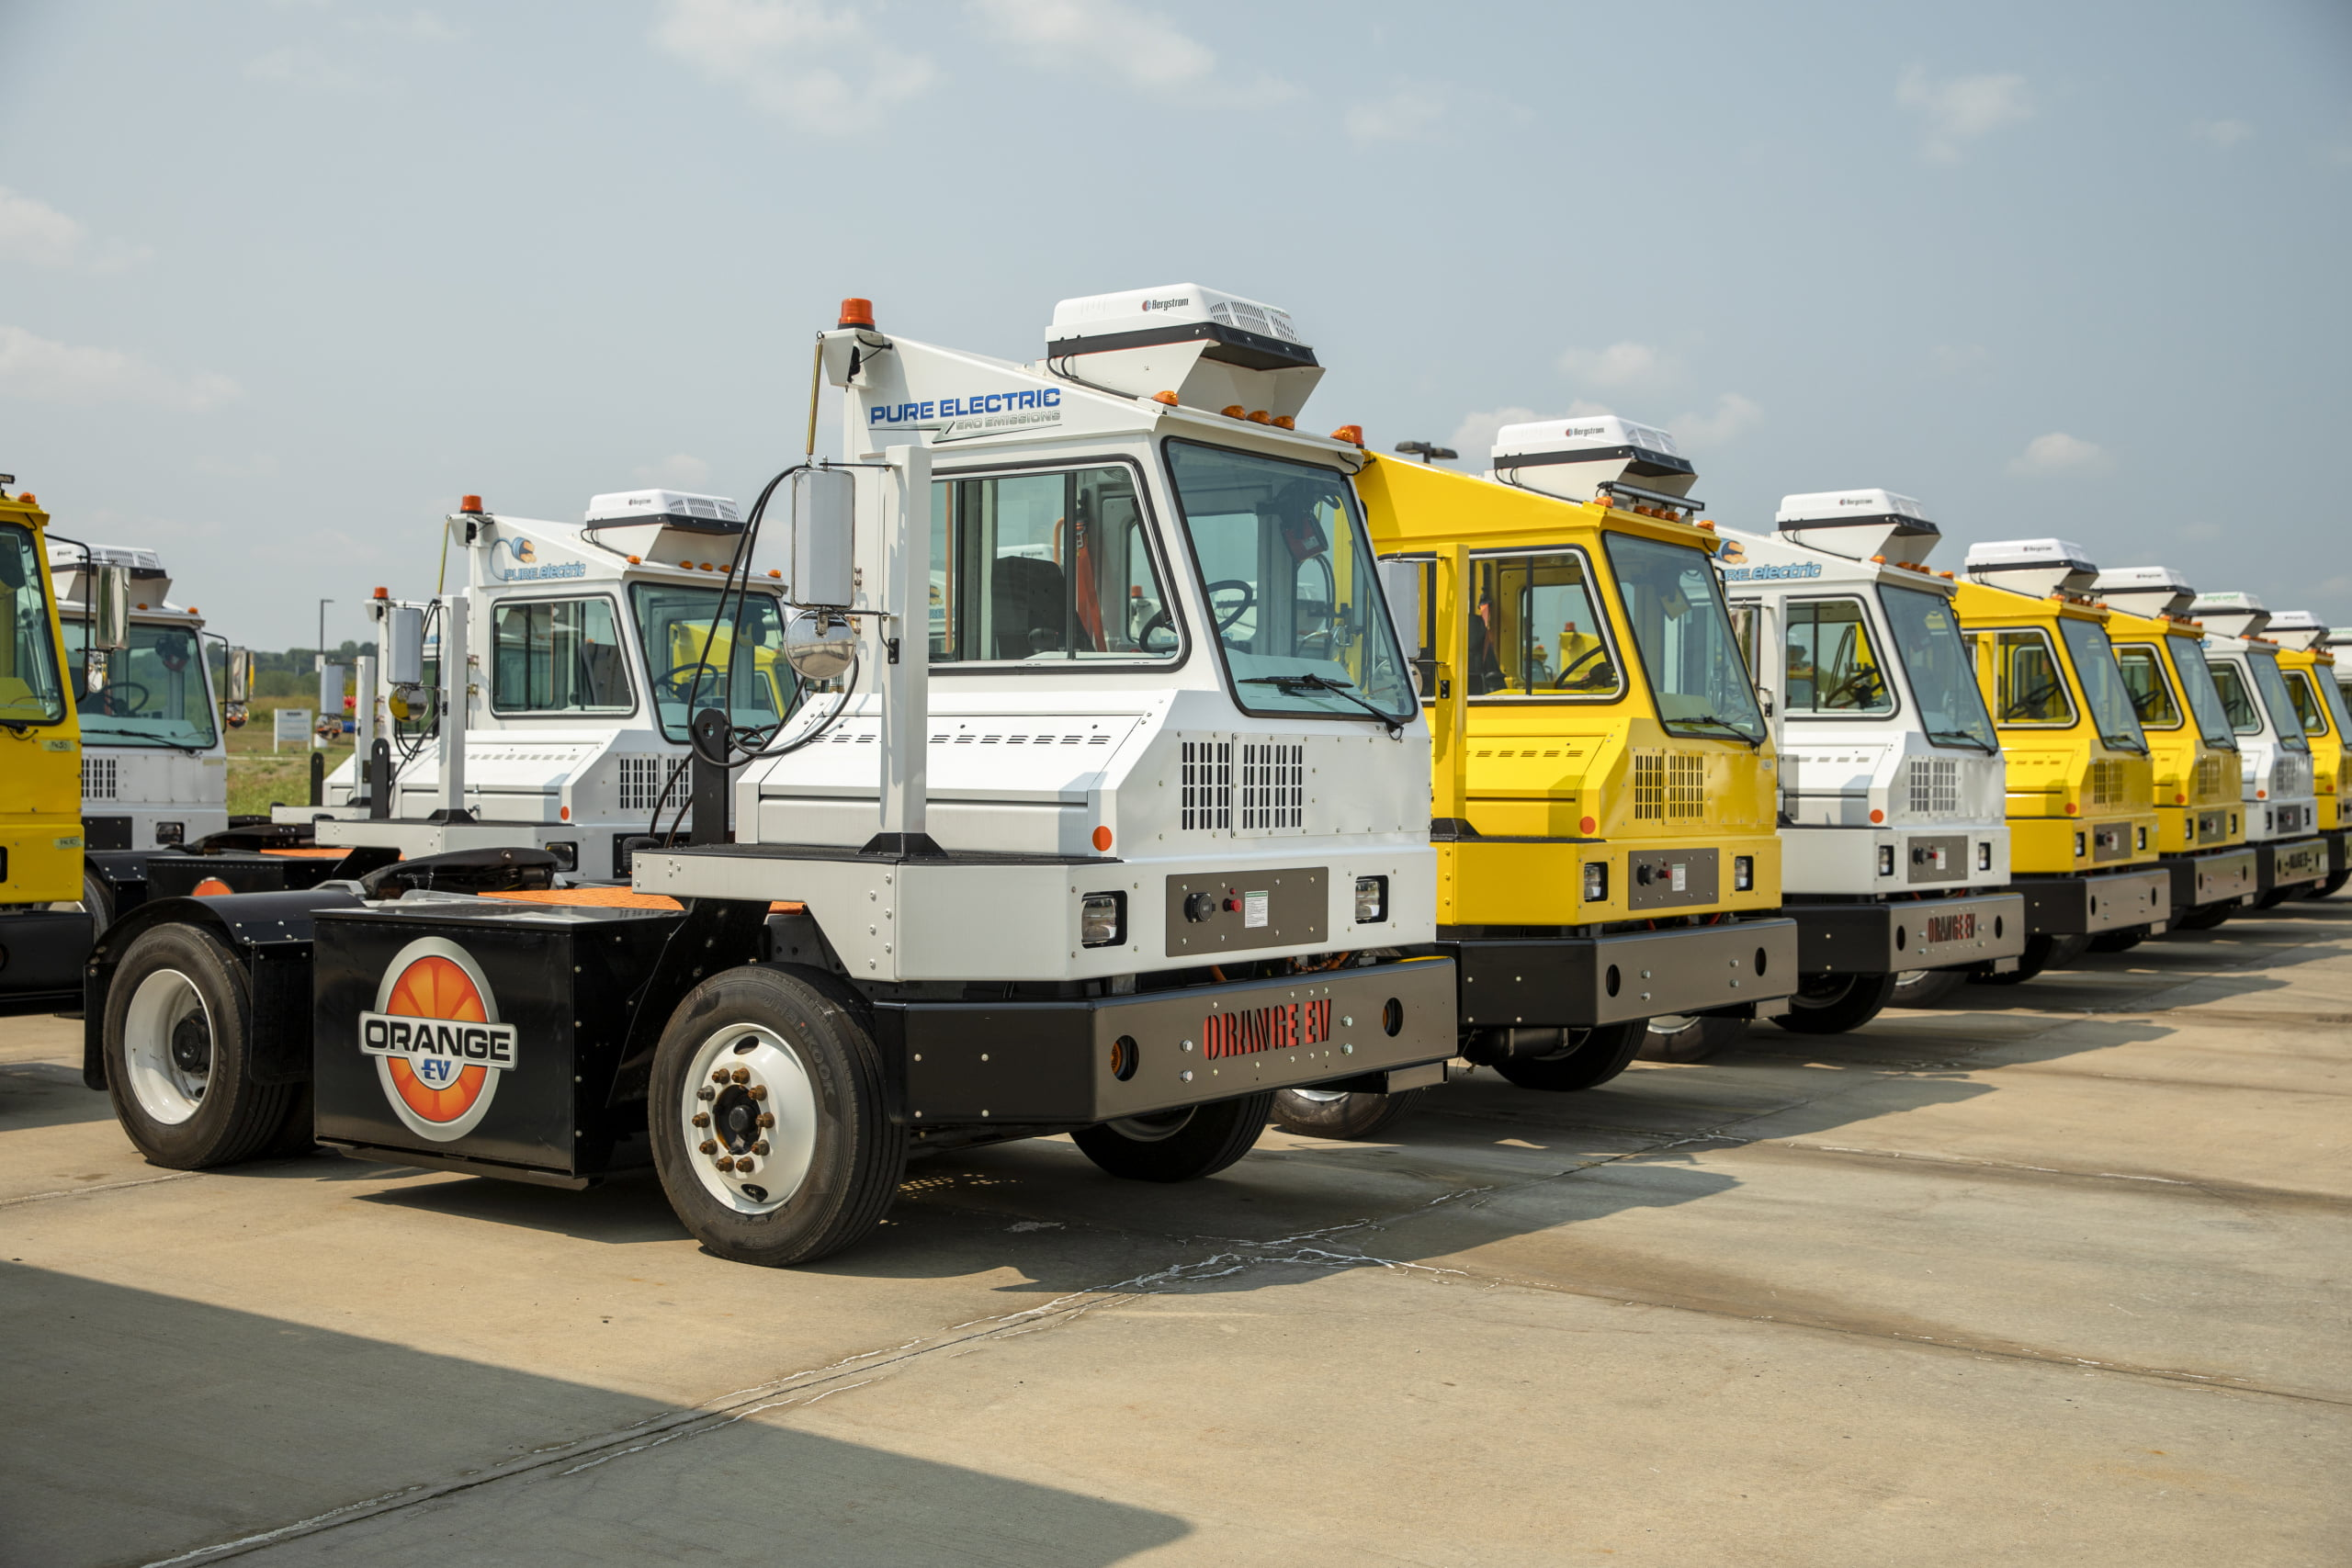 Orange EV trucks